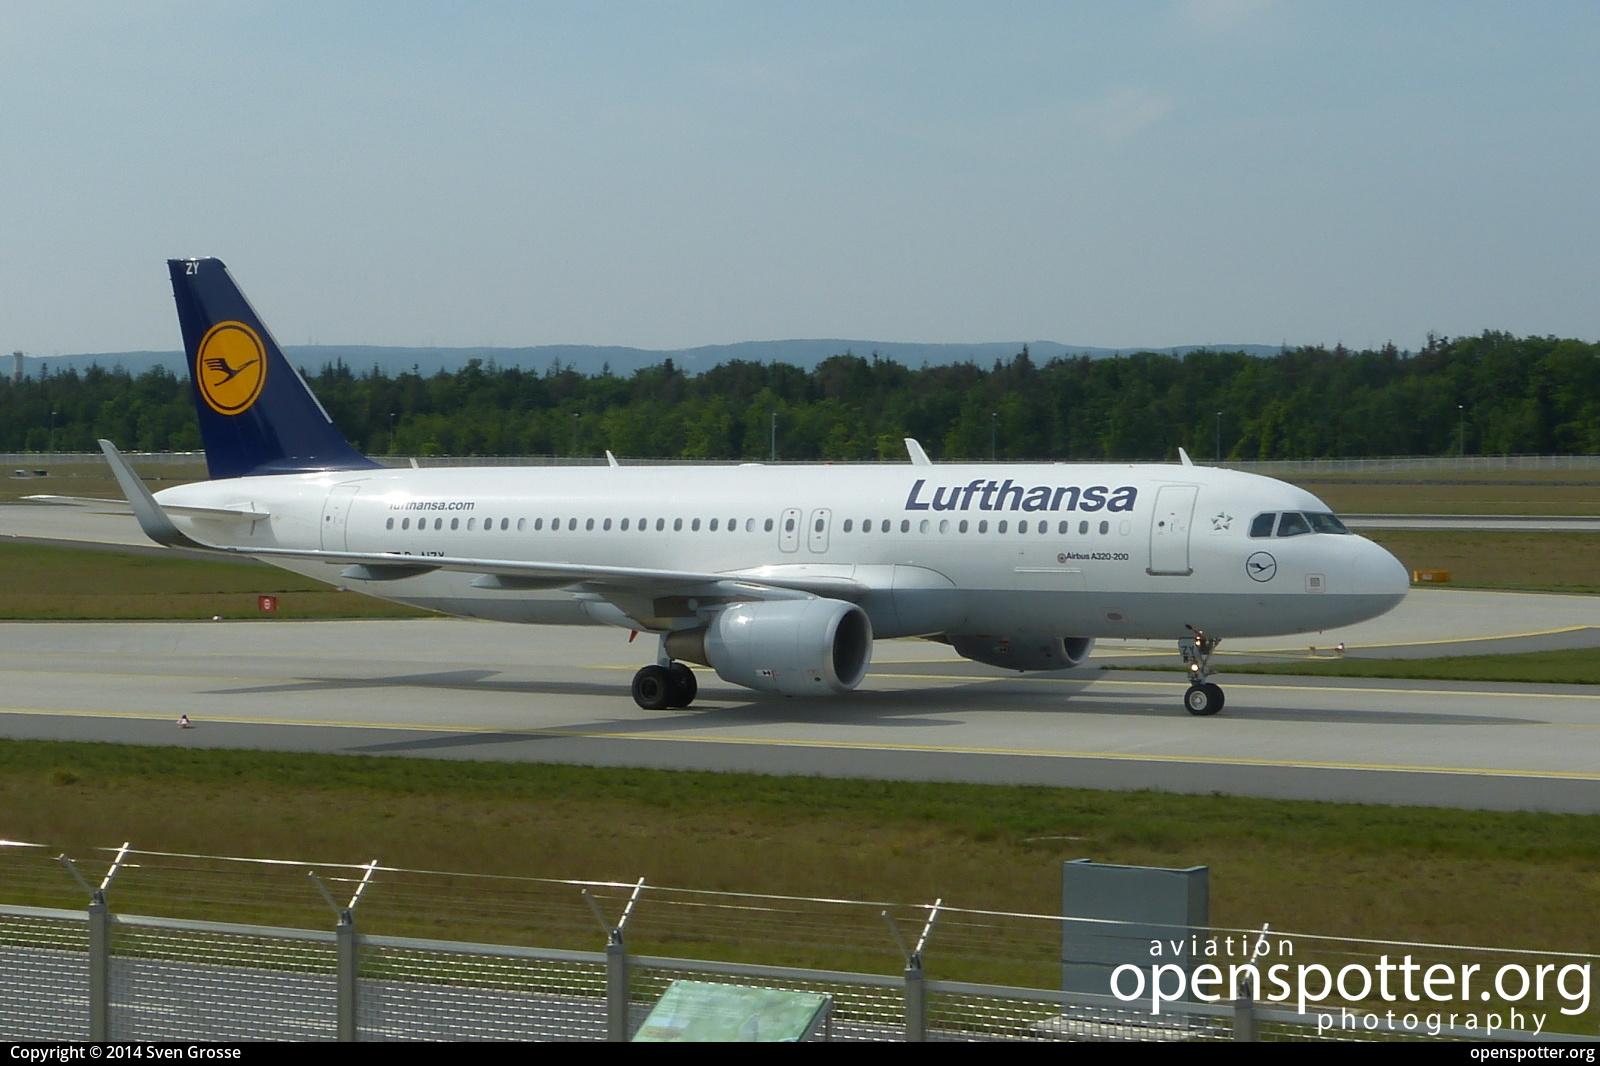 D-AIZY - Lufthansa Airbus A320-214(WL) at Frankfurt International Airport (FRA/EDDF) taken by Sven Grosse   openspotter.org   ID: 51513